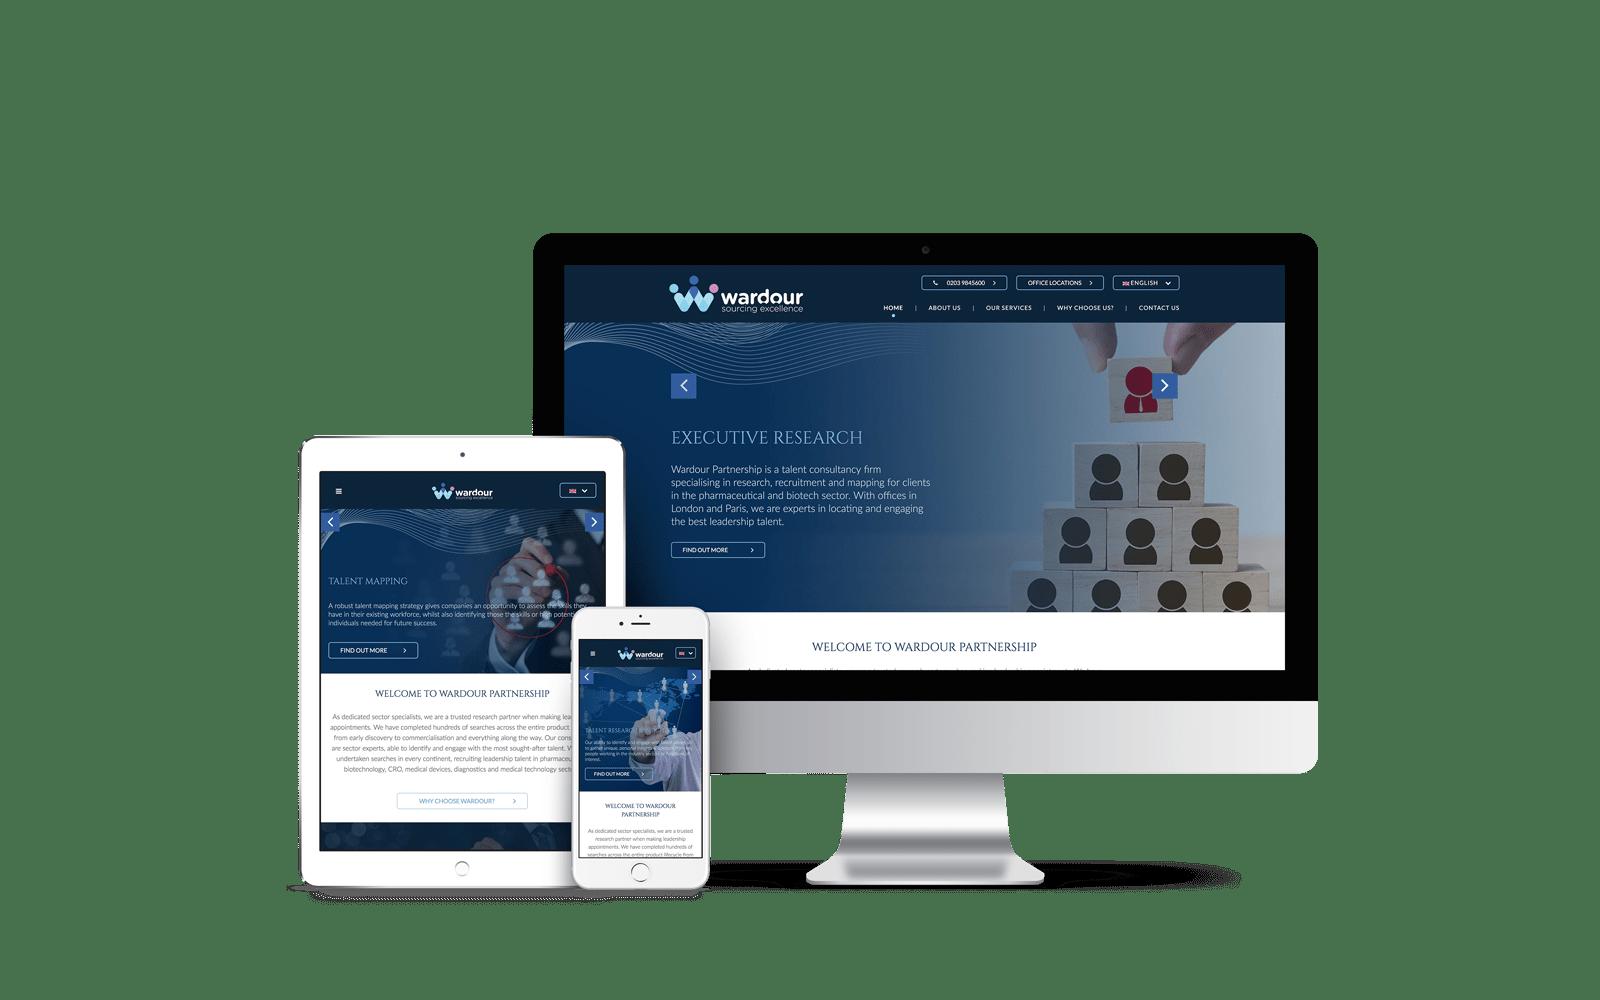 Website Design for Wardour Partnership